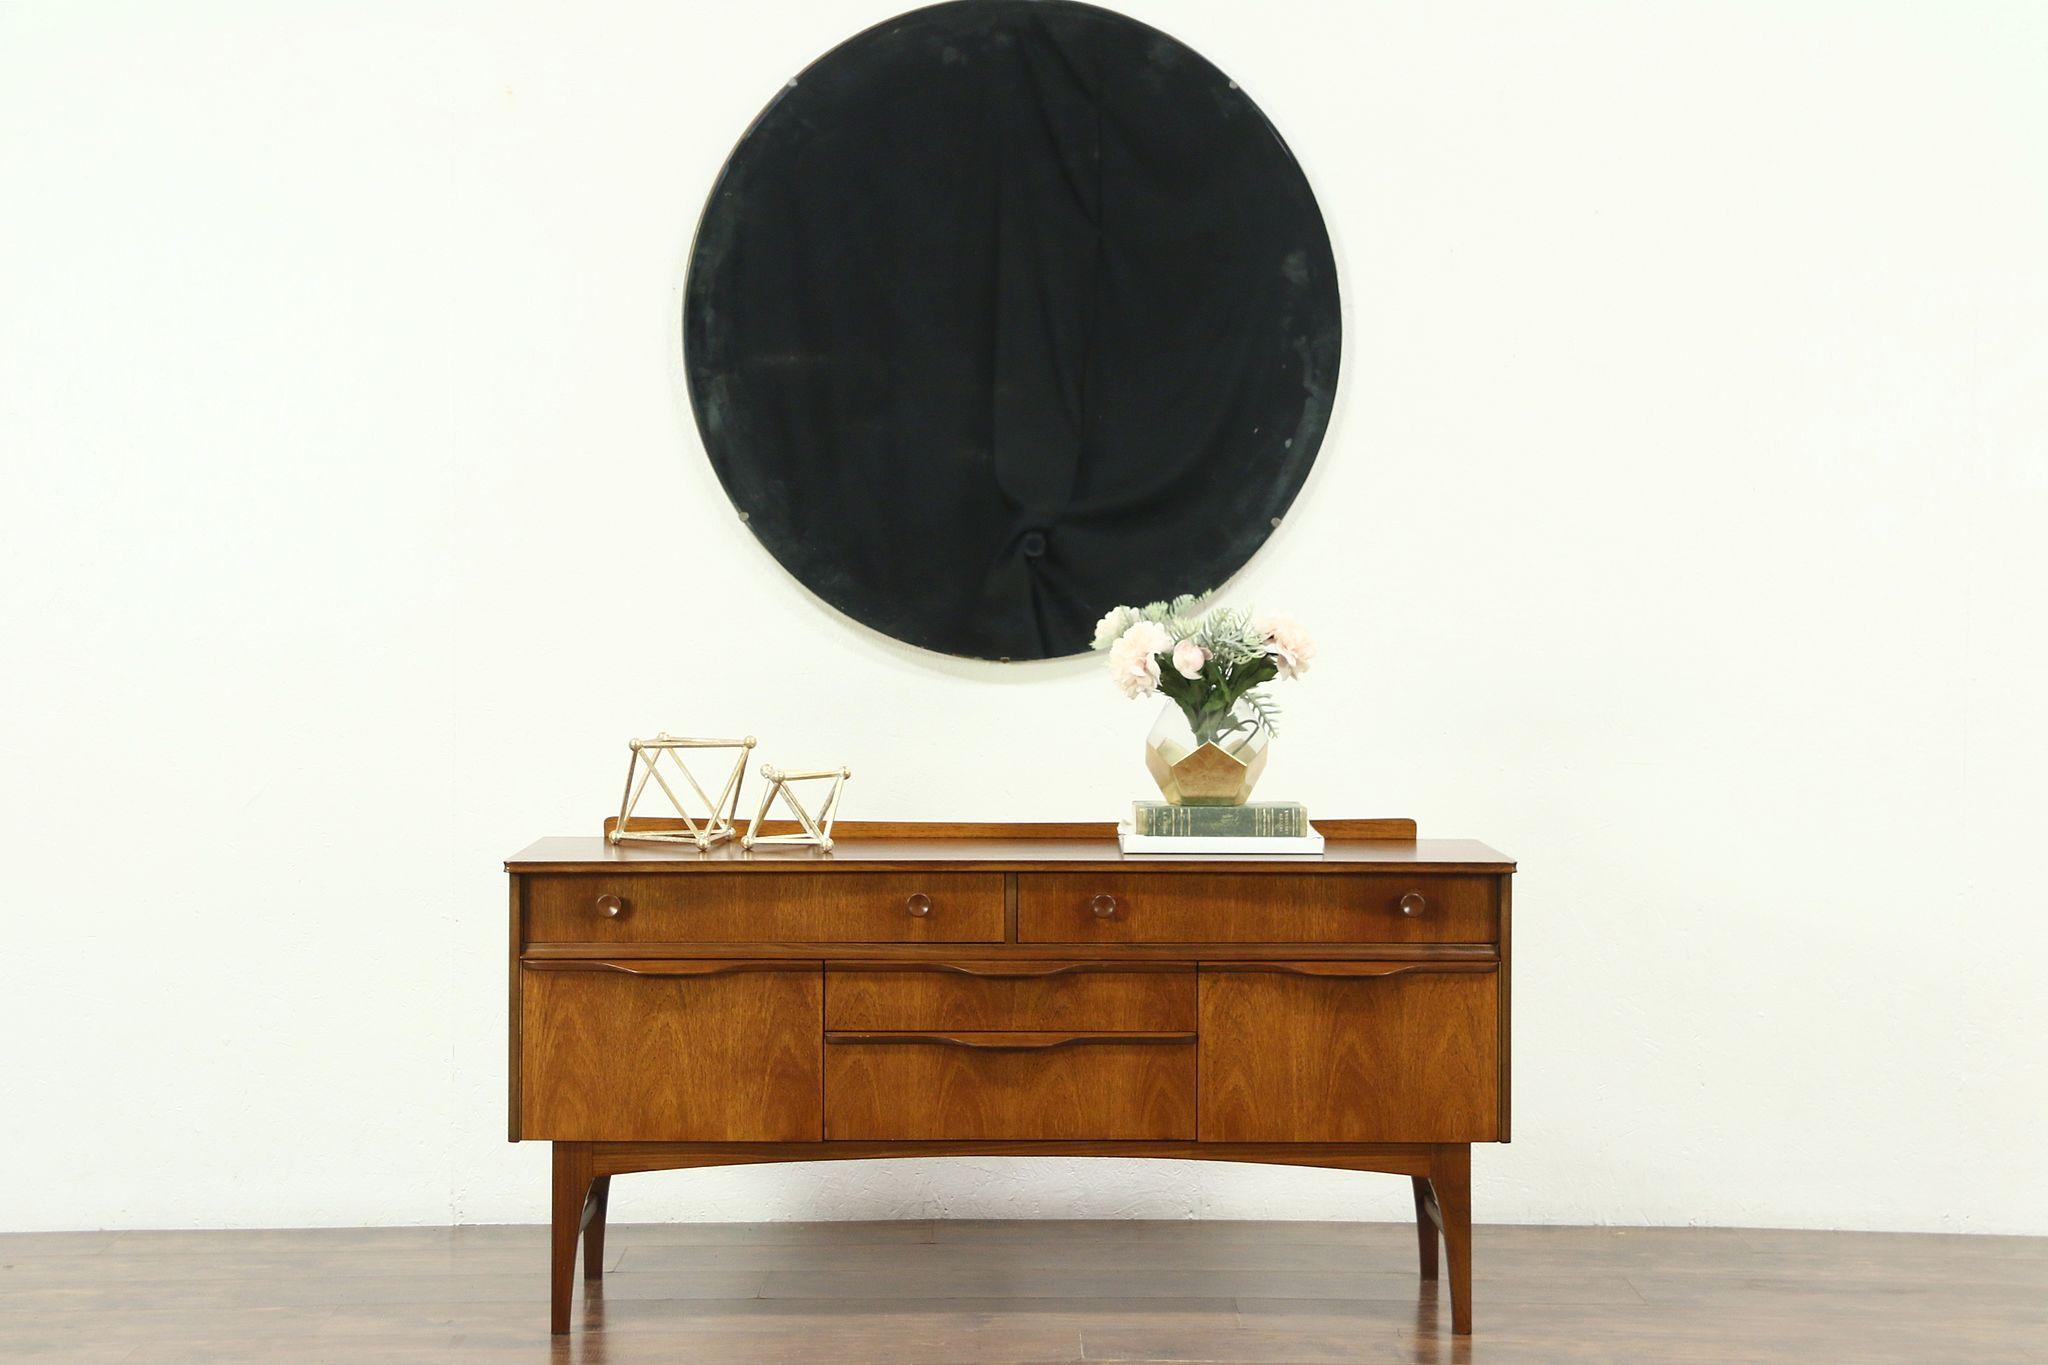 Sold Teak Midcentury Modern 1960 Vintage Tv Or Hall Entry Console Cabinet Sideboard Harp Gallery Antiques Furniture